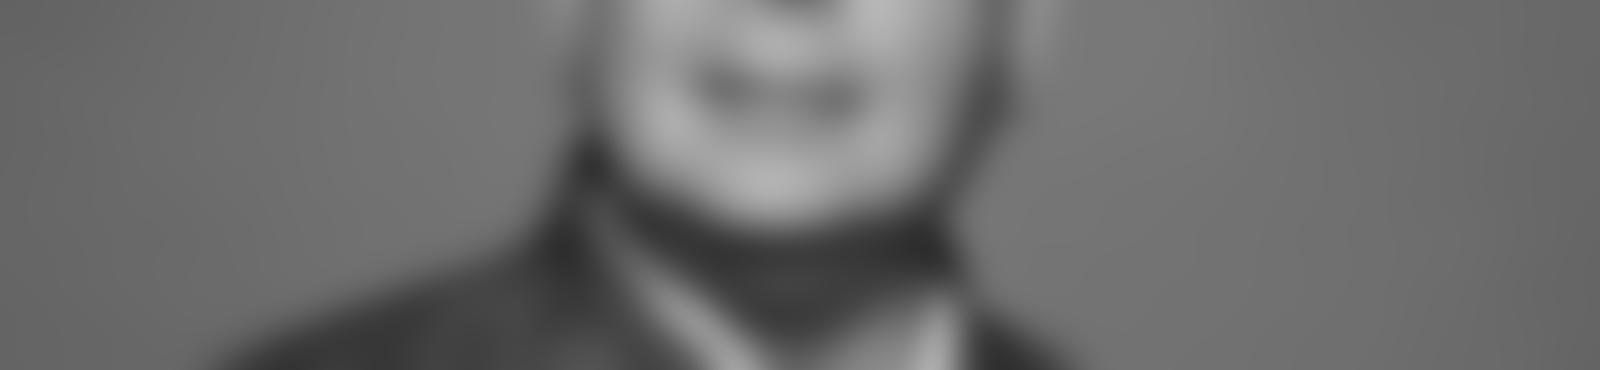 Blurred c7d7ad0f 6e97 48f4 a2b2 0abf4b853f2f